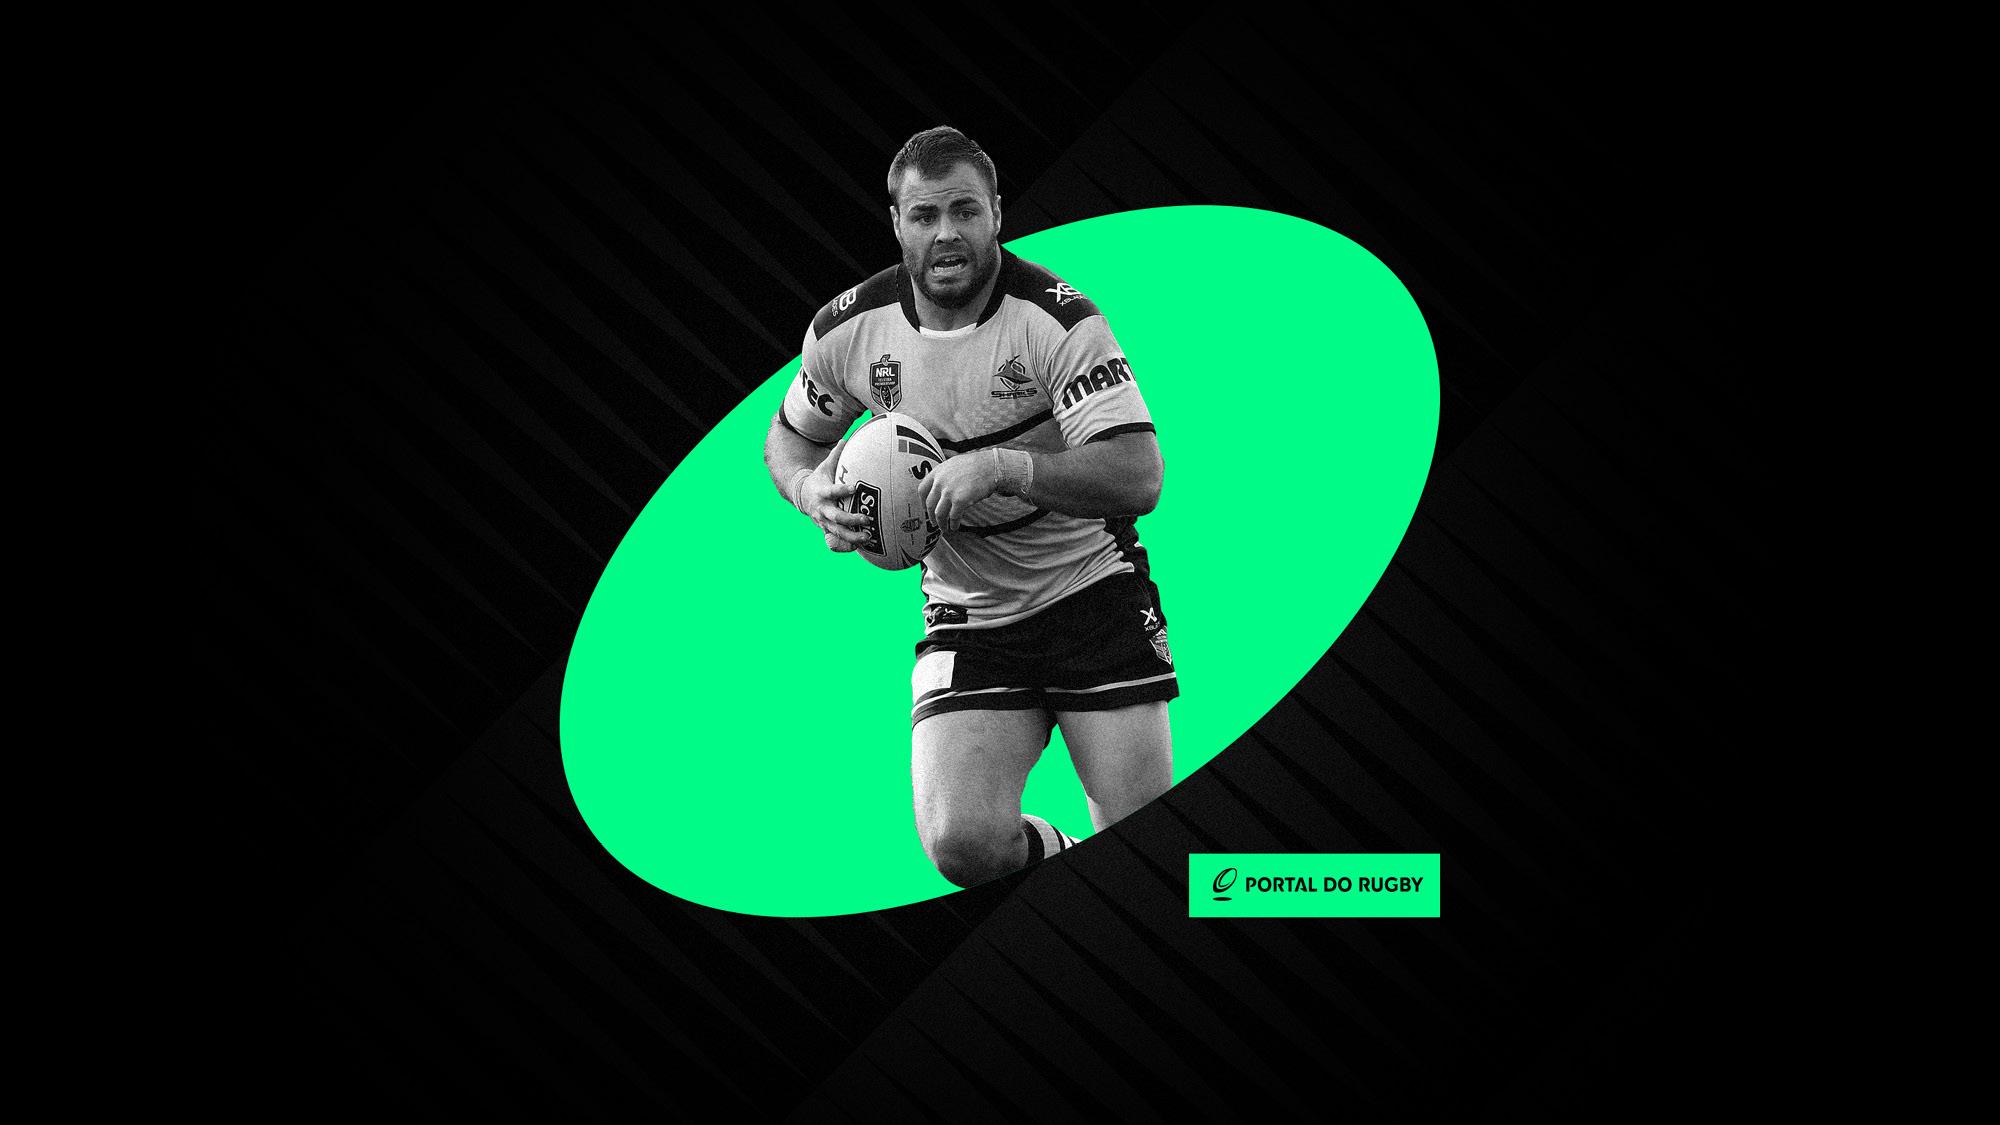 Nacione-Branding-Portal-do-Rugby33